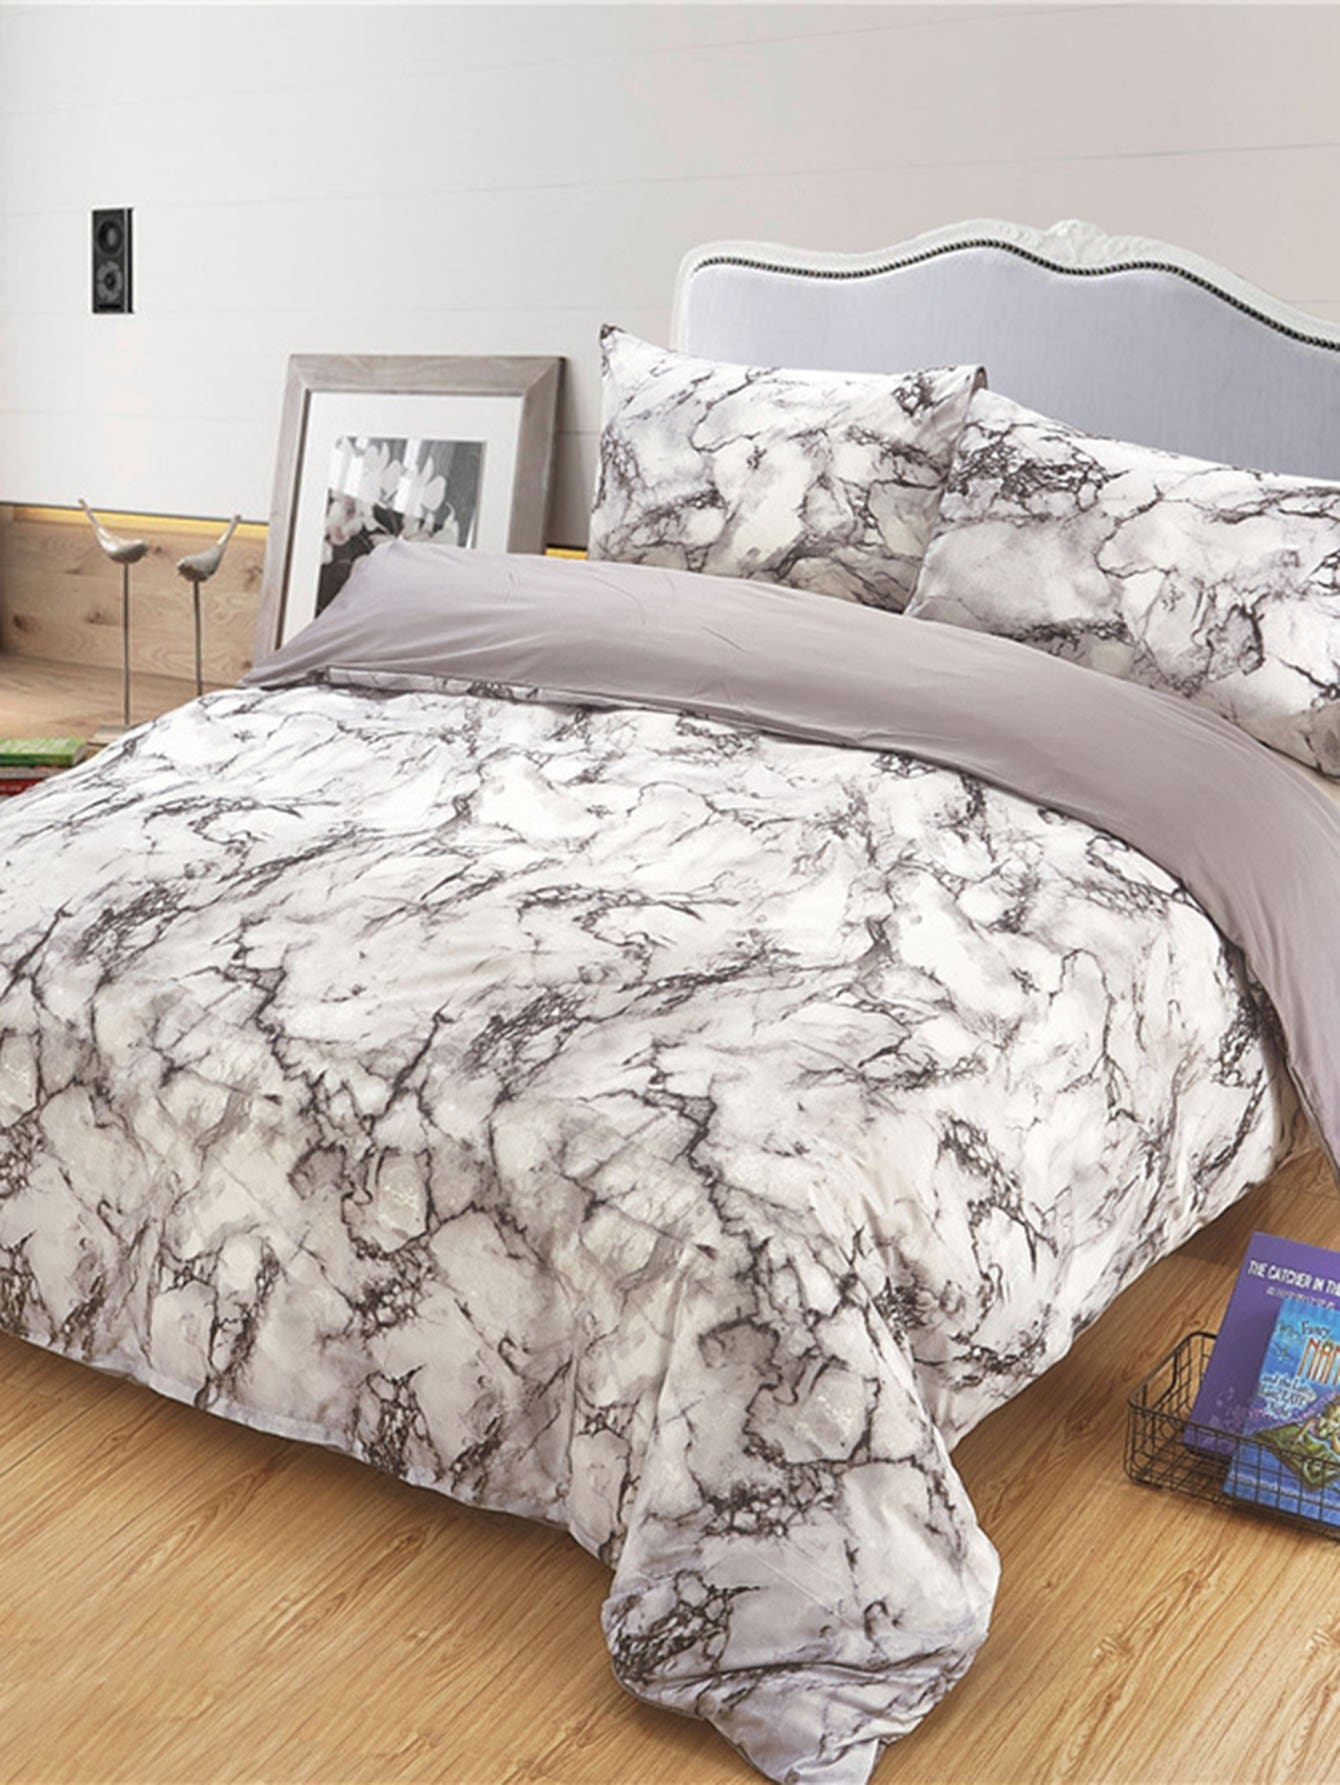 bettlaken set mit marmor muster german romwe. Black Bedroom Furniture Sets. Home Design Ideas